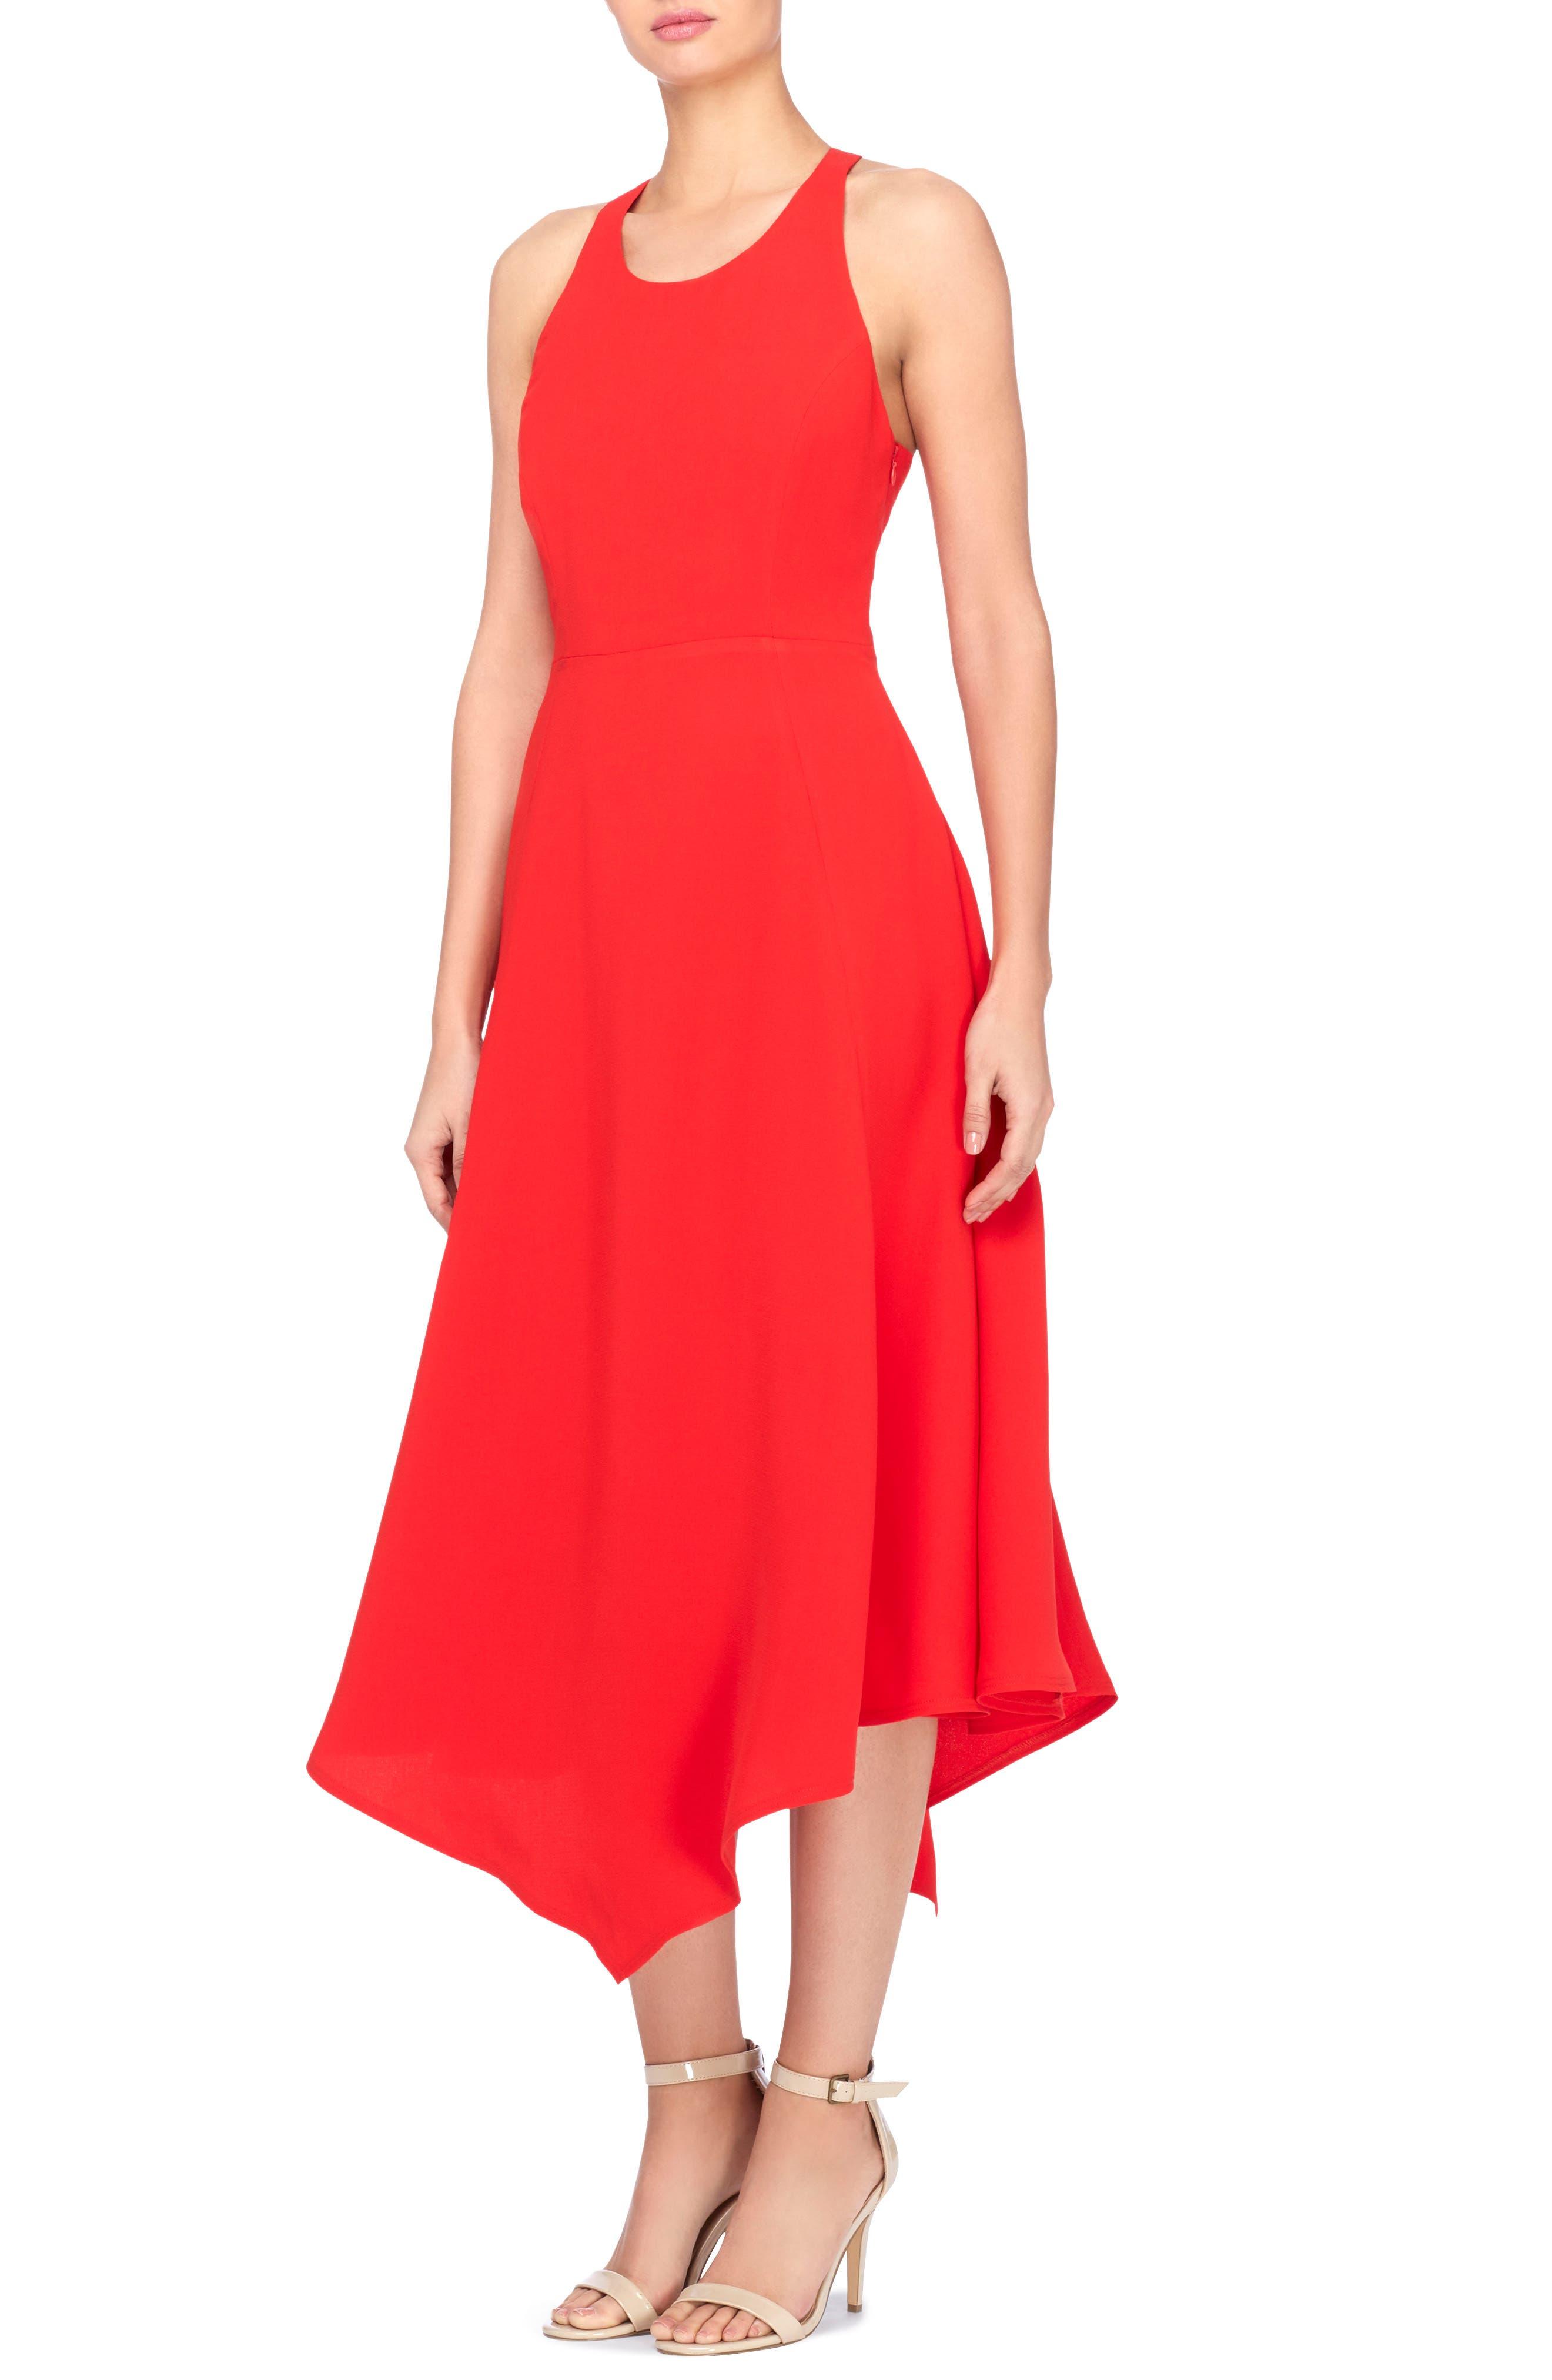 Catherine Catherine Malandrino Reggie T-Back Fit & Flare Dress